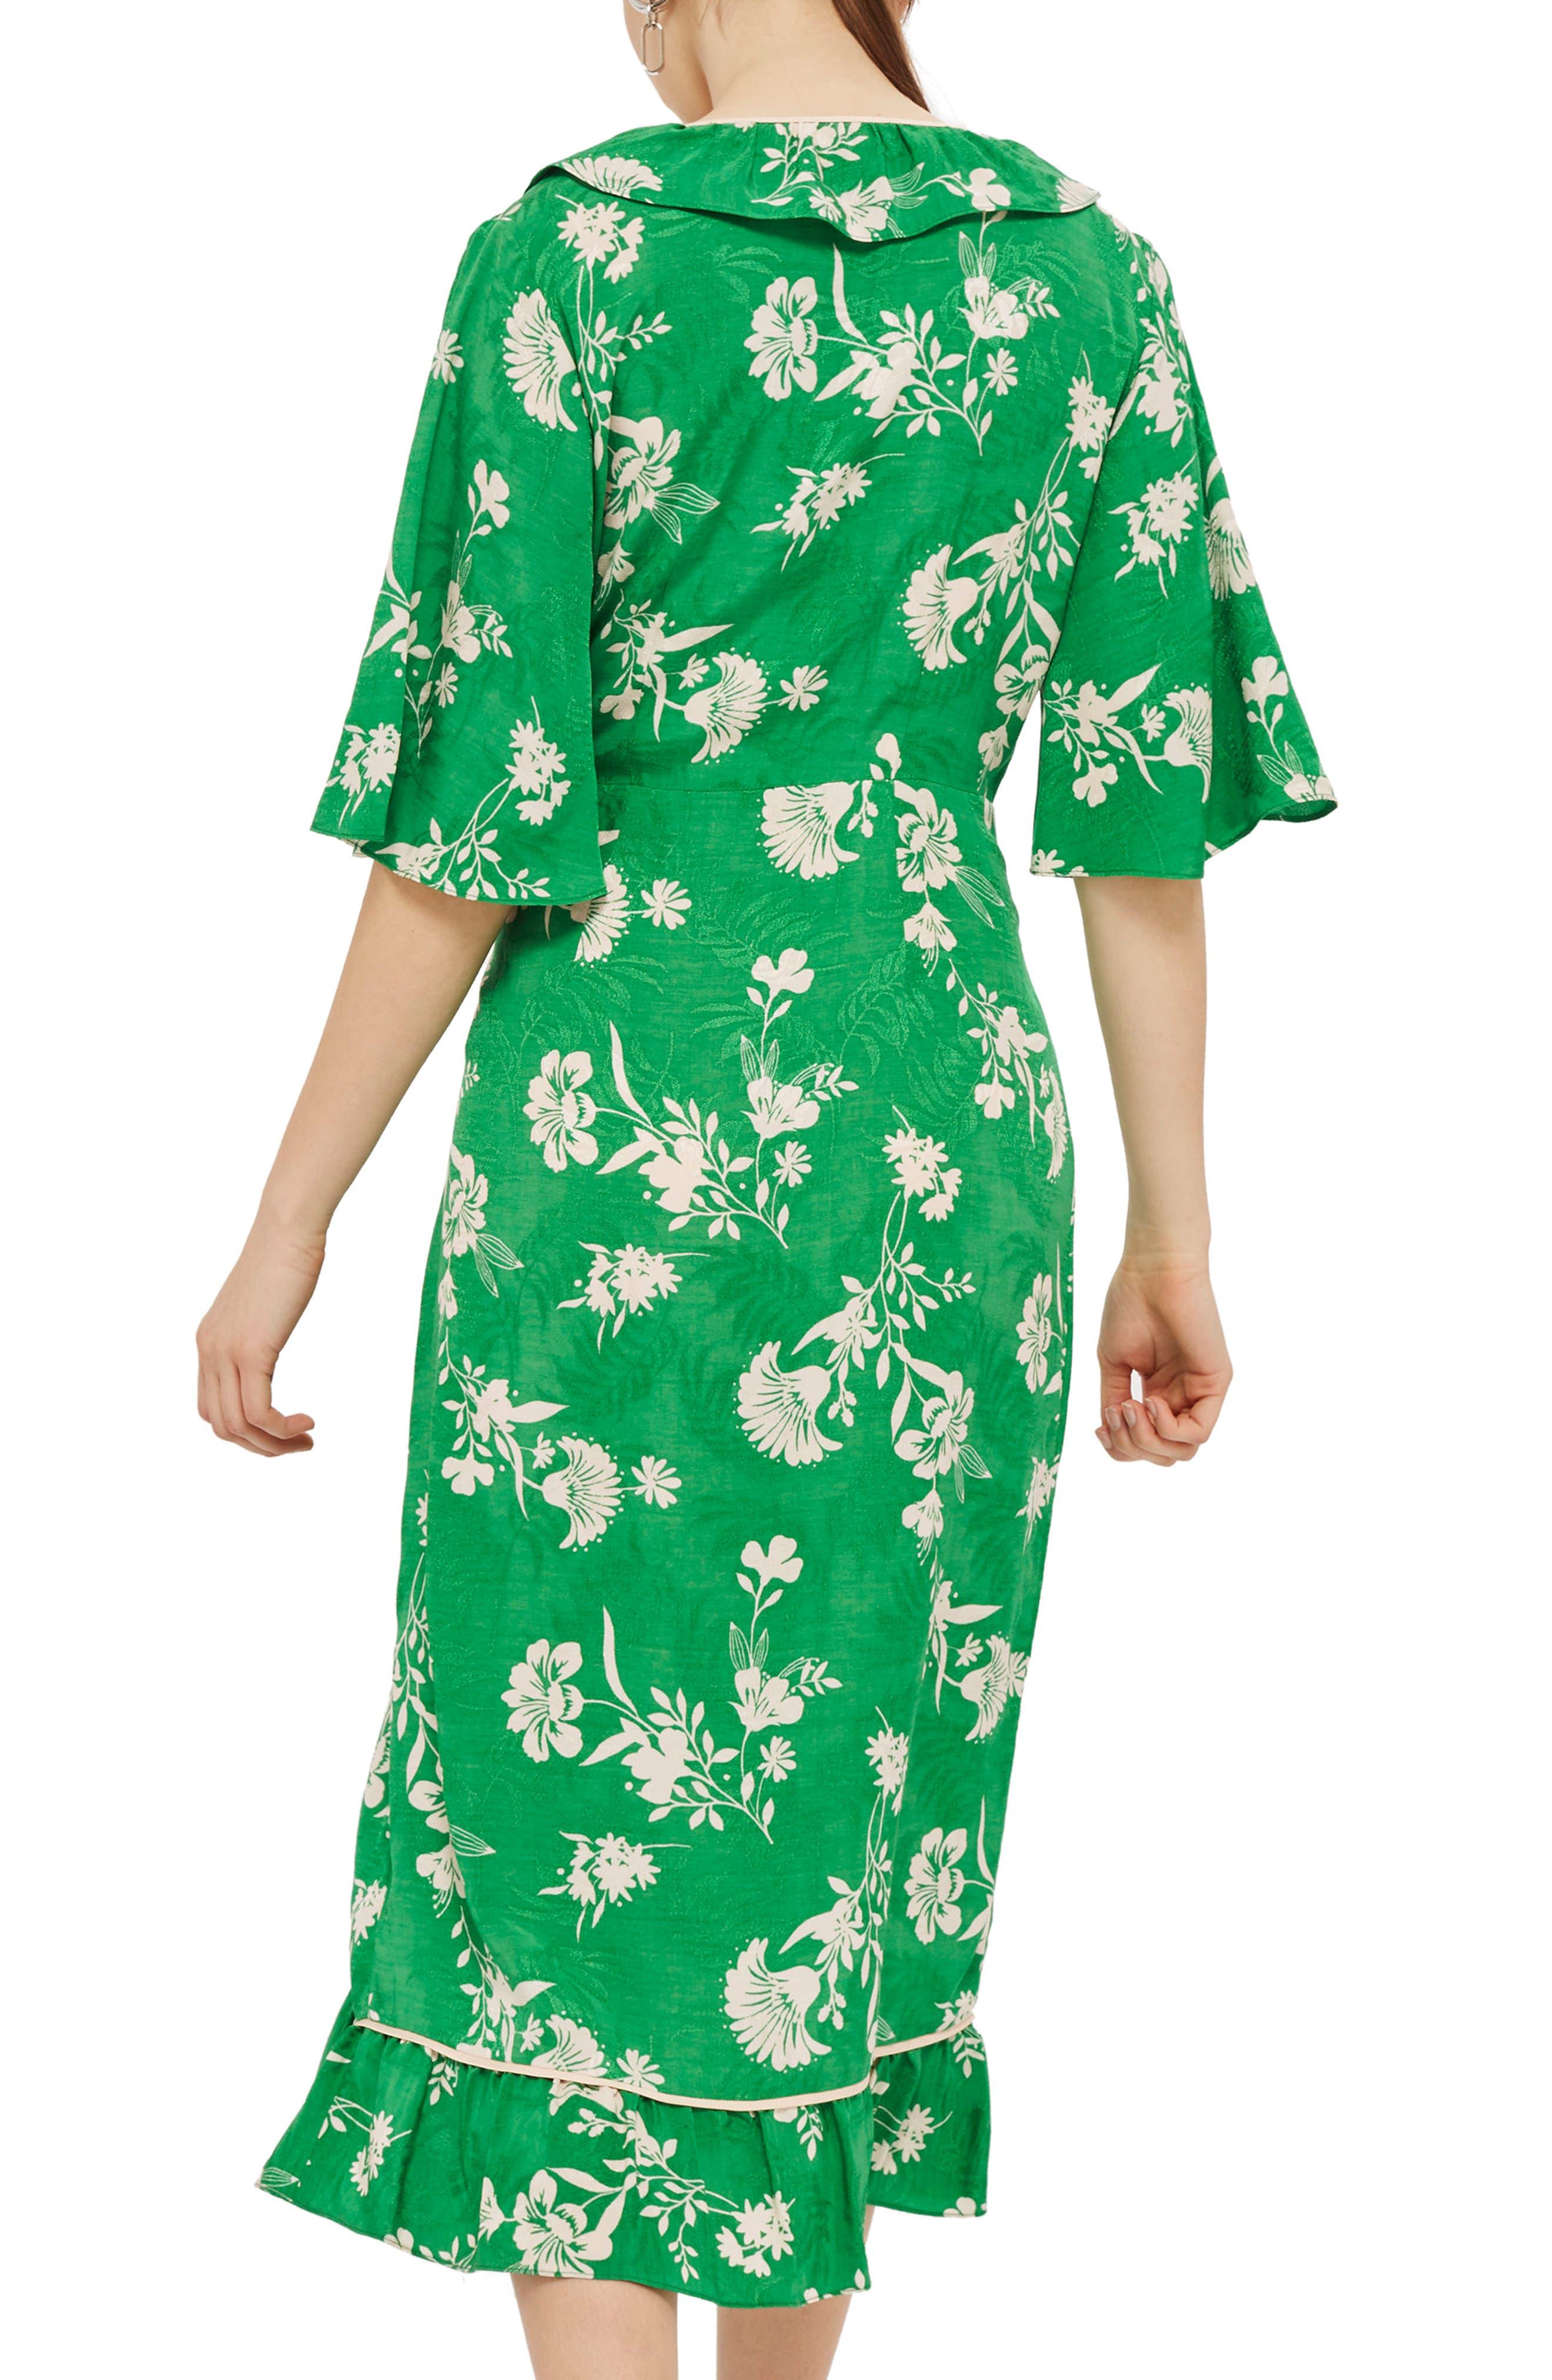 Leaf Print Ruffle Wrap Dress,                             Alternate thumbnail 2, color,                             300